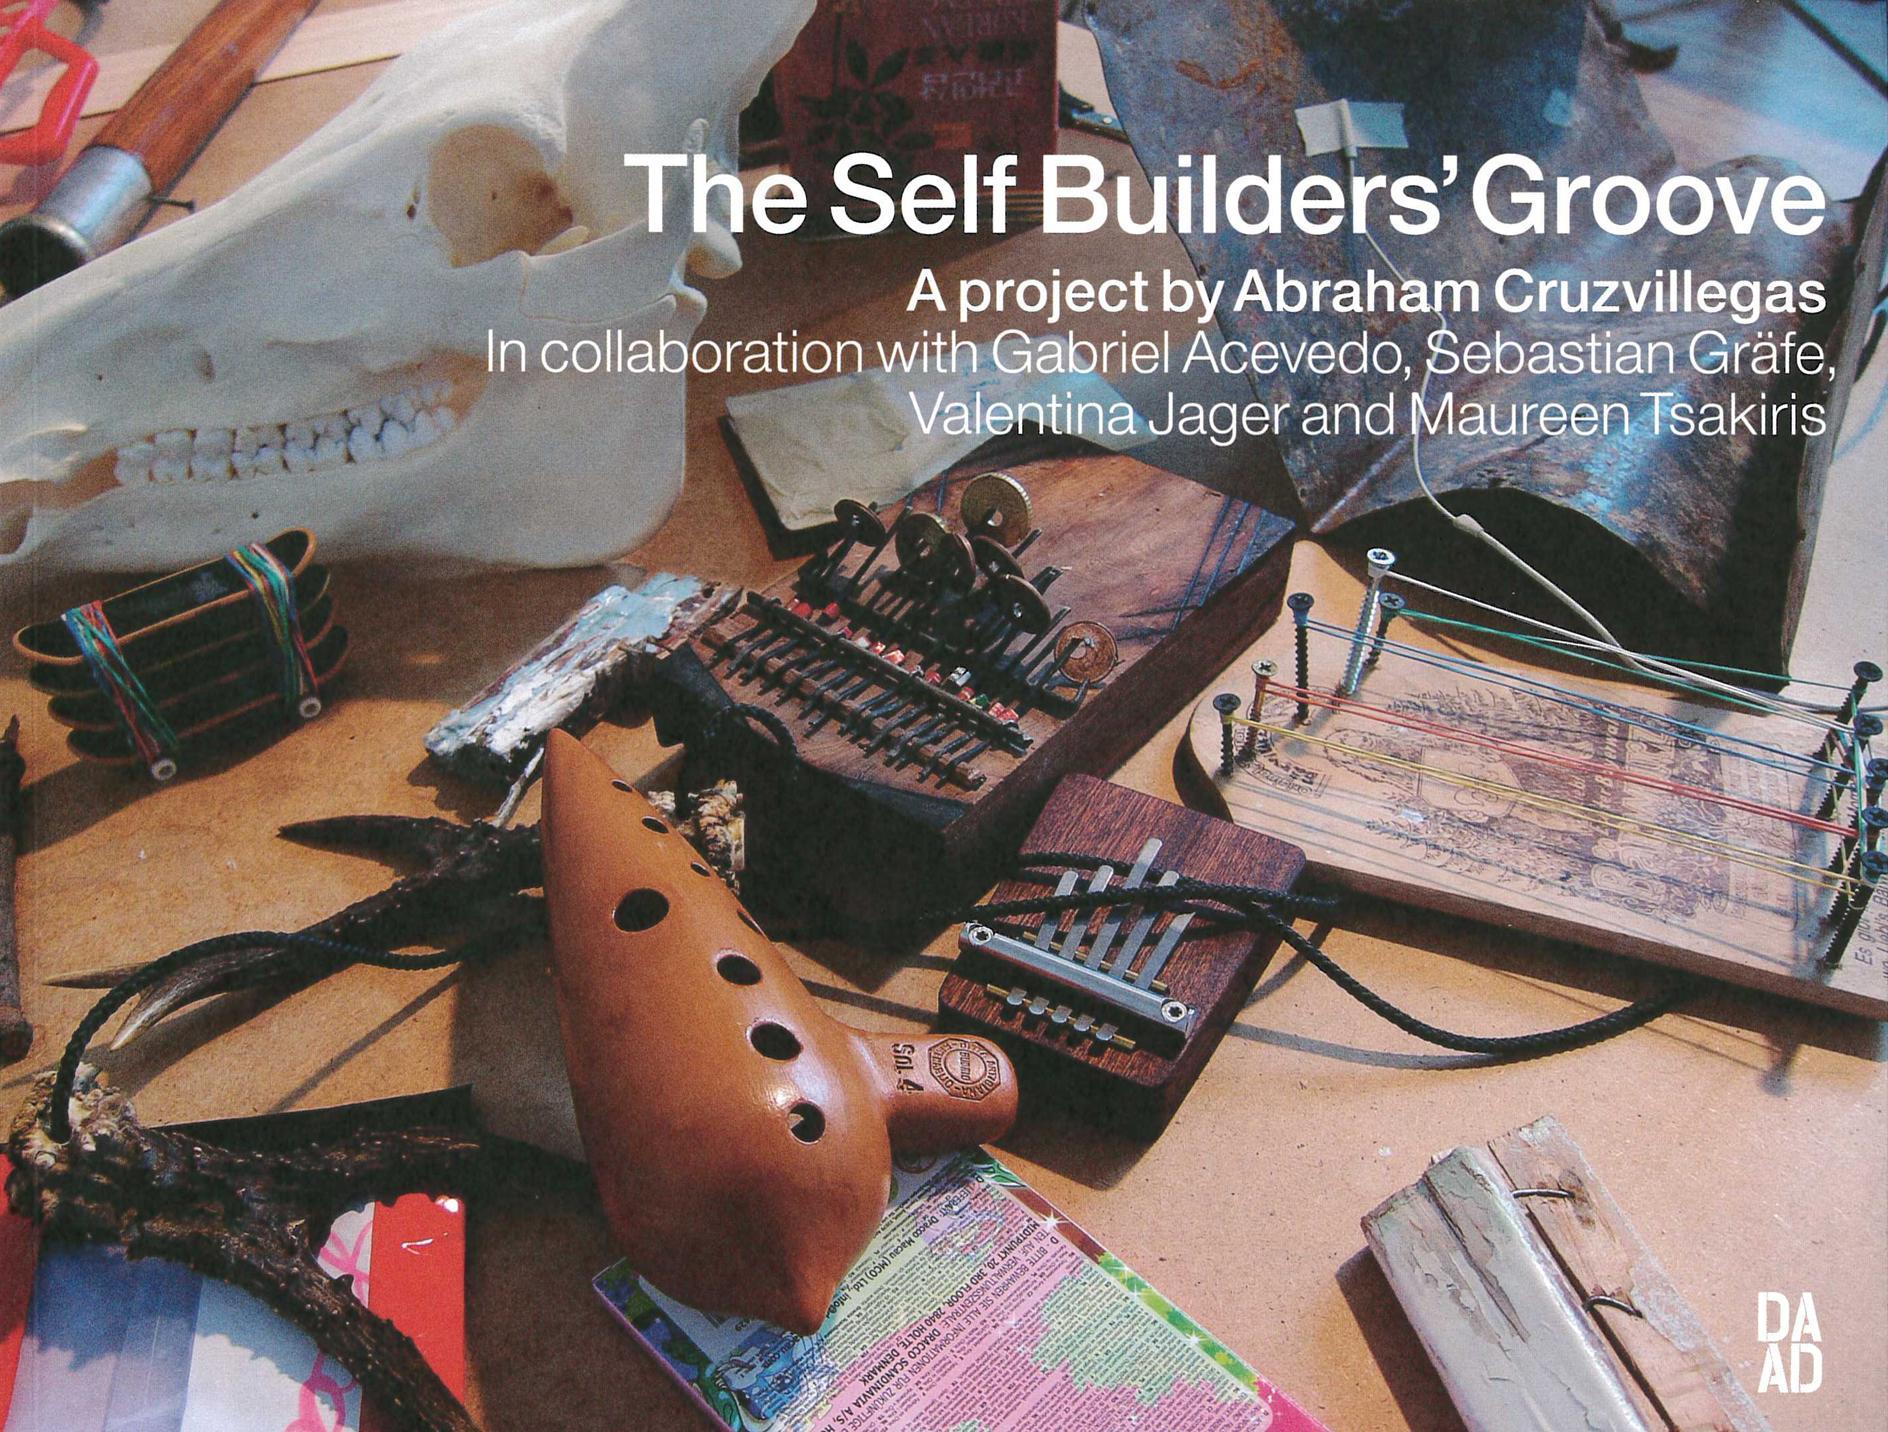 The Self Builders' Groove